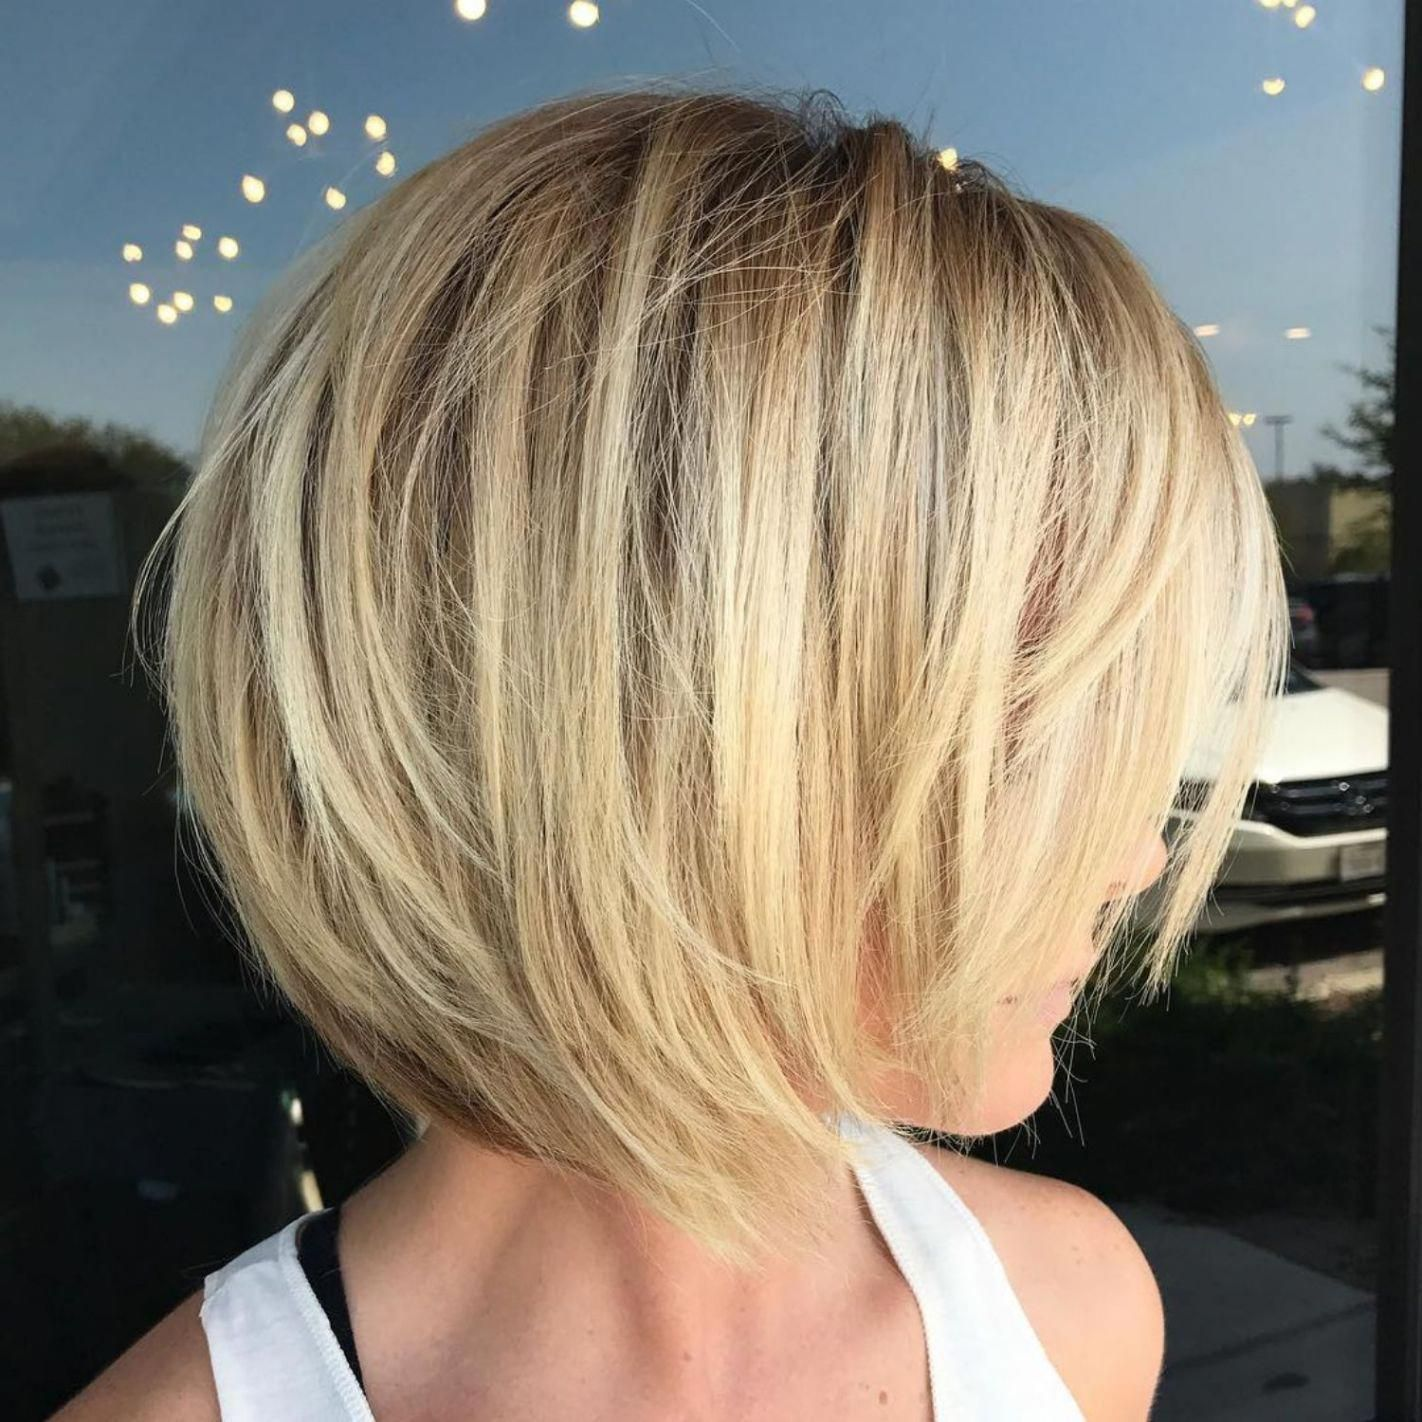 Blonde Layered Bob For Fine Hair Bobhairstylesforfinehair Bob Hairstyles For Fine Hair Wavy Bob Hairstyles Bob Hairstyles